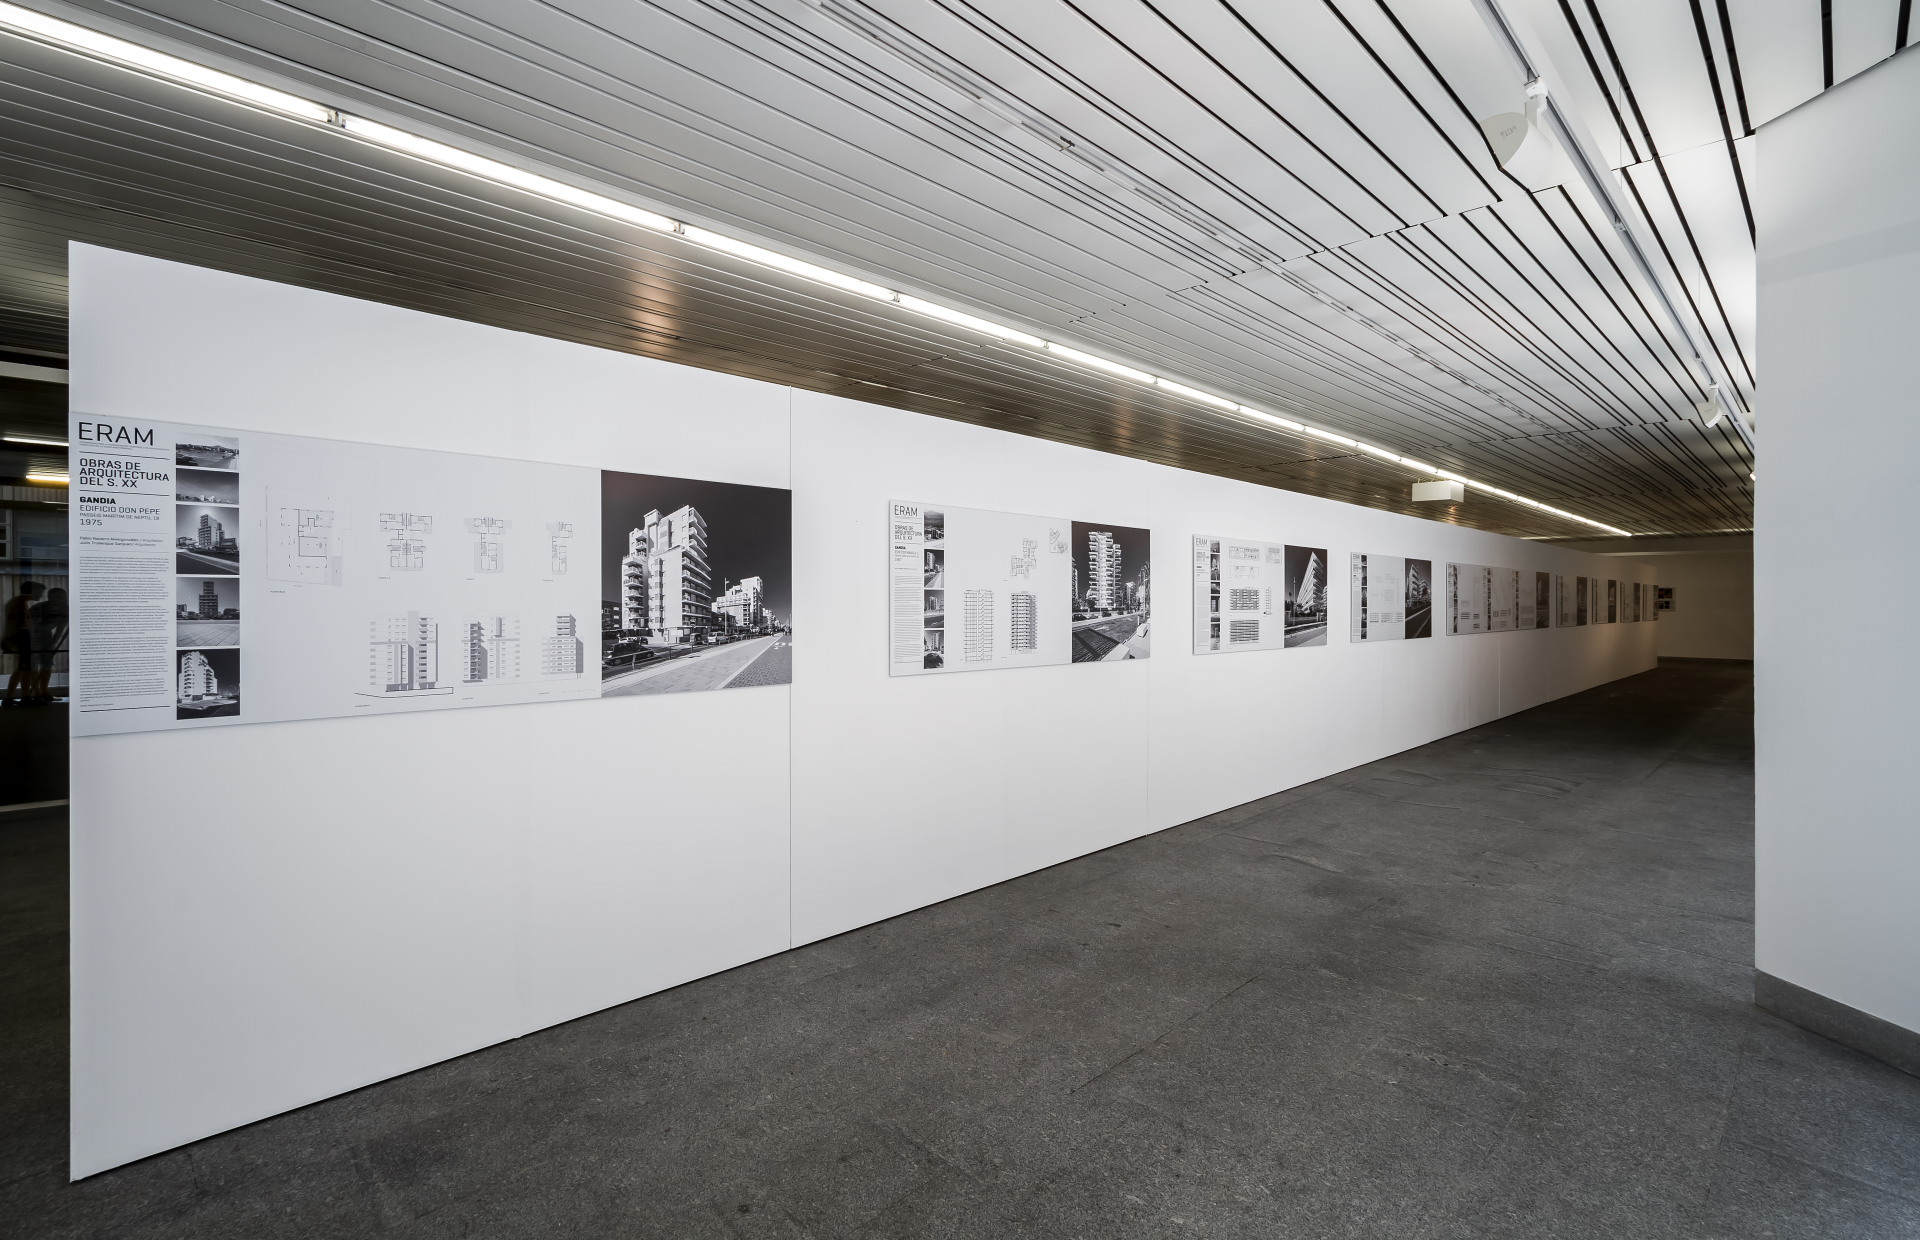 fotografia-arquitectura-valencia-german-cabo-upv-etsav-eram-exposicion (8)